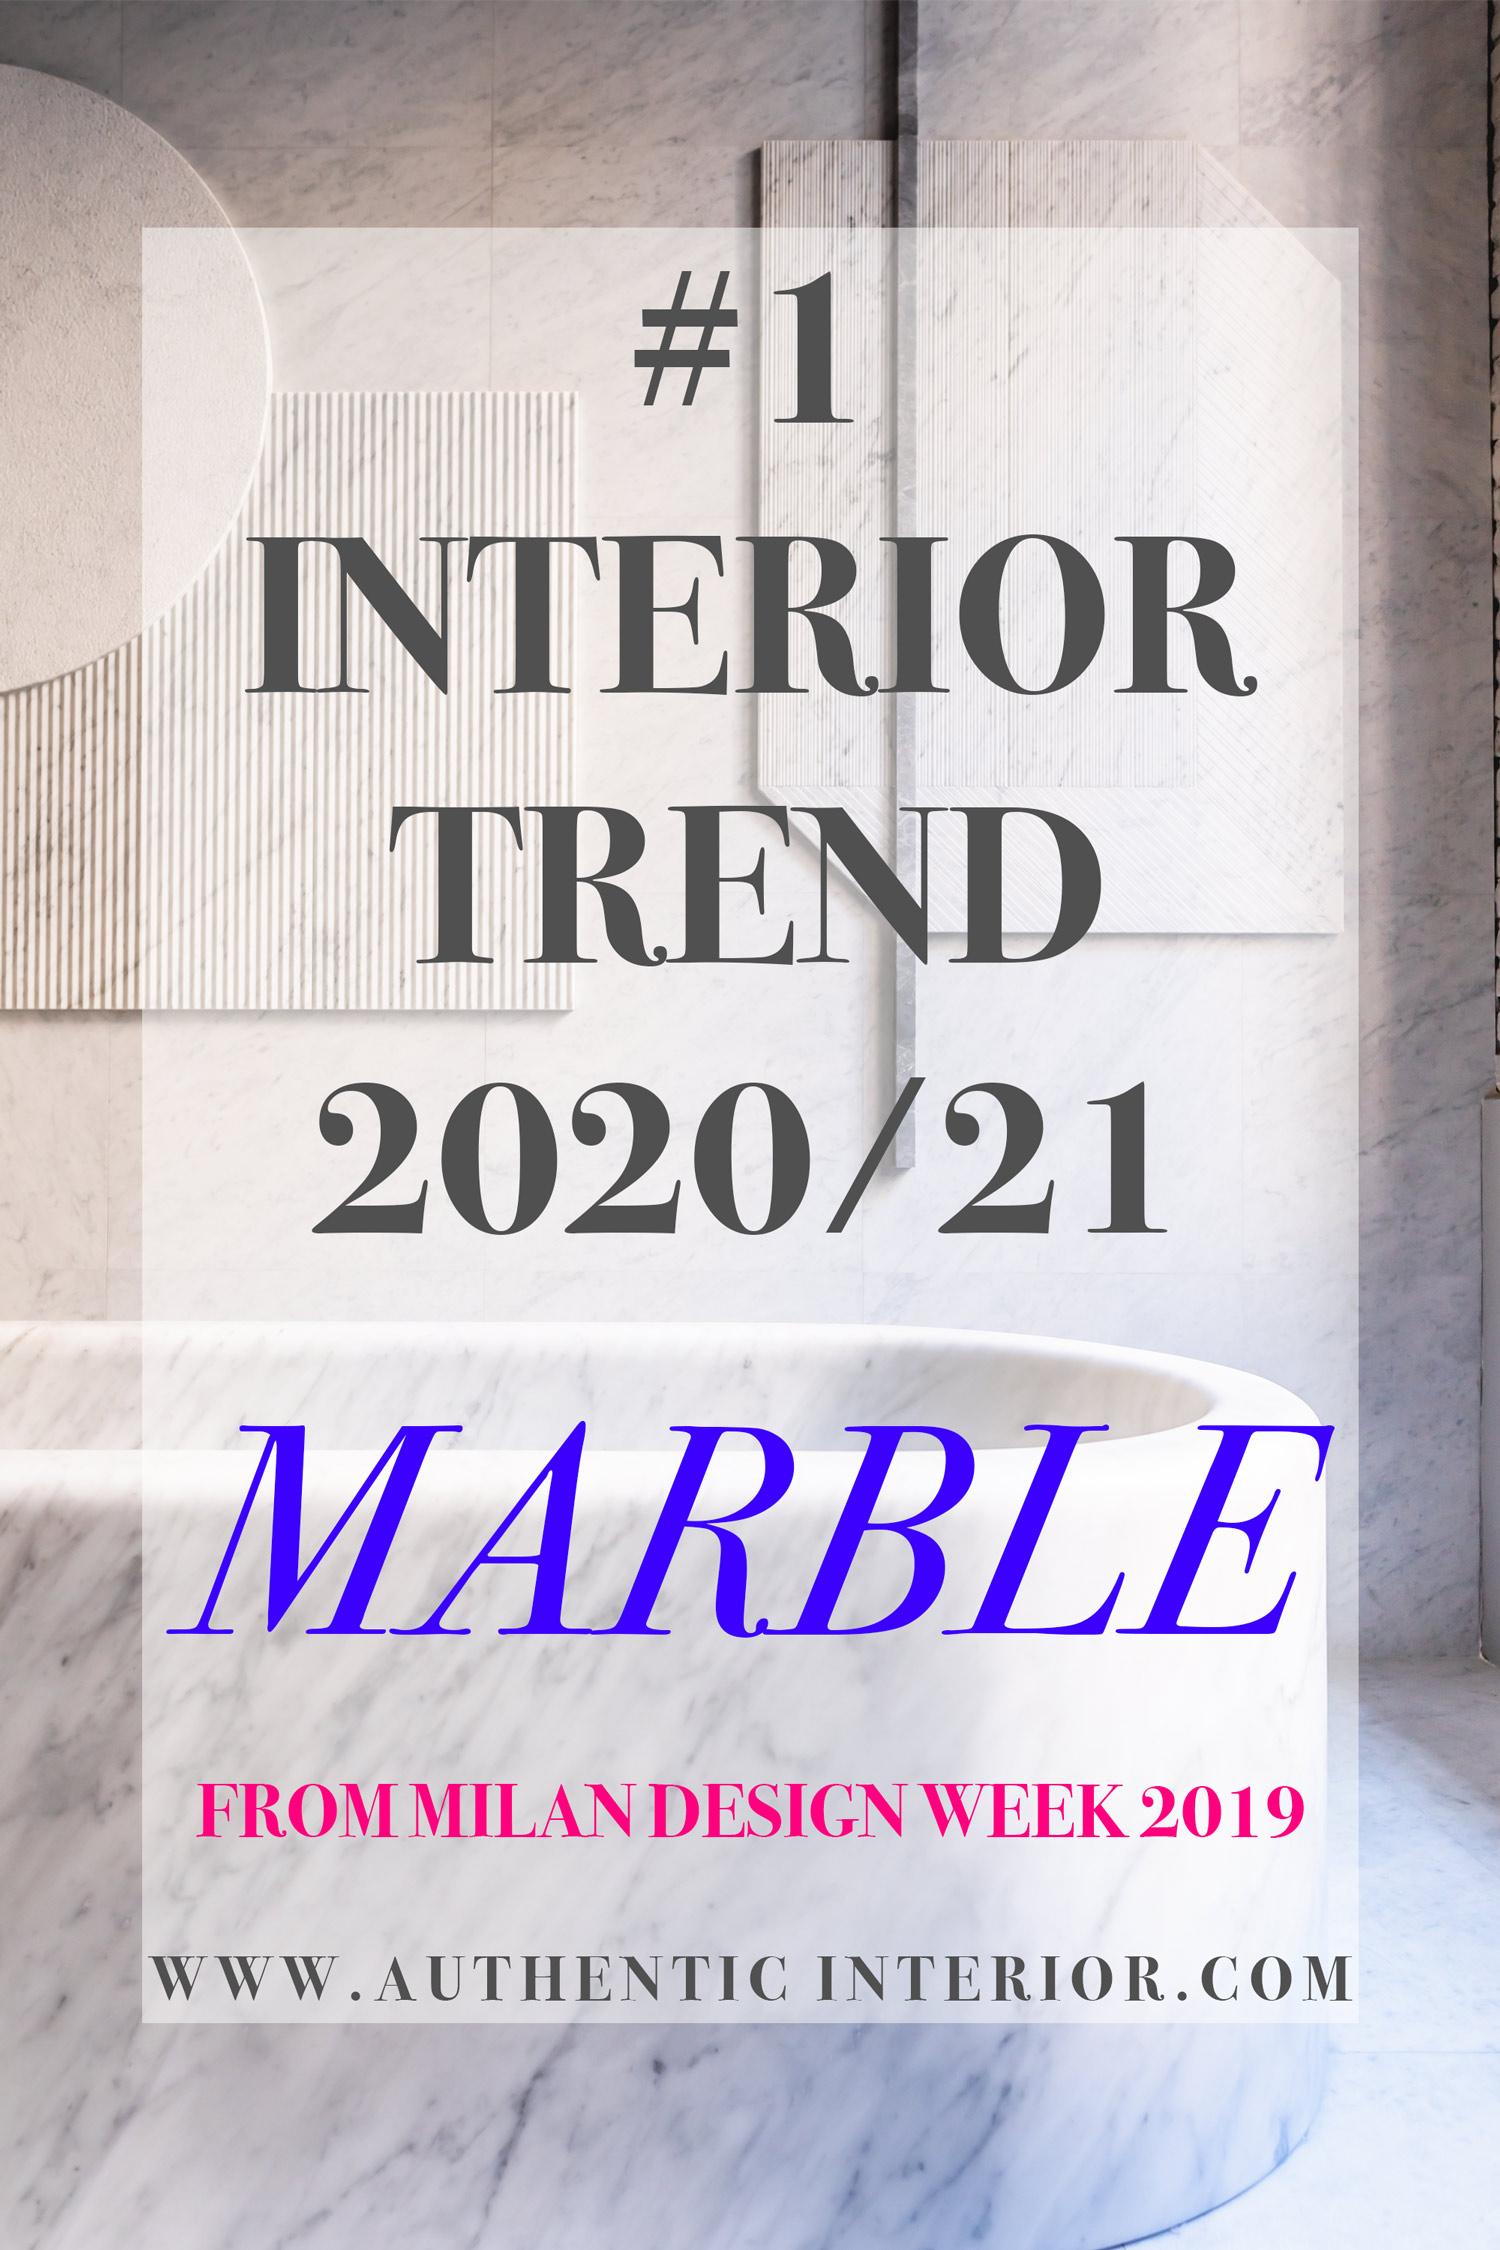 Interior design trends for 2020_Marble interior design trends 2020_Authentic Interior design blog_interior design trends for 2020